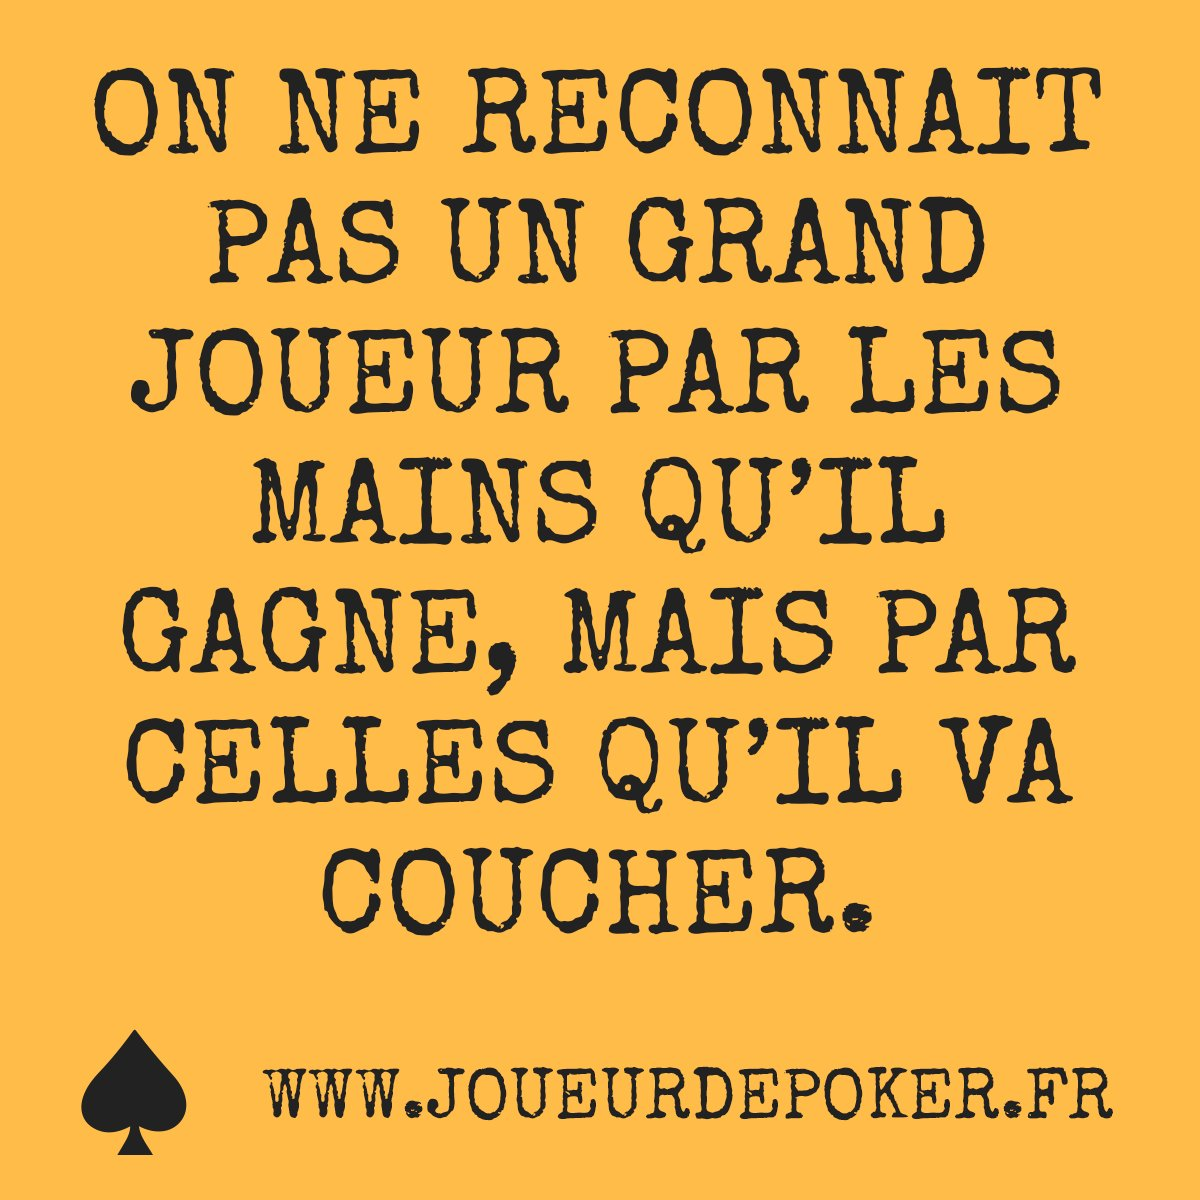 #pokerface #holdem #nolimit #texasholdem #grind #texasholdemtournament #pokertshirt #tshirt #tshirts #pokershirt citation #jpeuxpasjaipoker #poker #pokernight #joueurdepoker #pokergrind #pokergear #pokerstyle #pokerplayer #pokerstars #texapoker #winamax #poker #citations <br>http://pic.twitter.com/A7KfmEdLGR